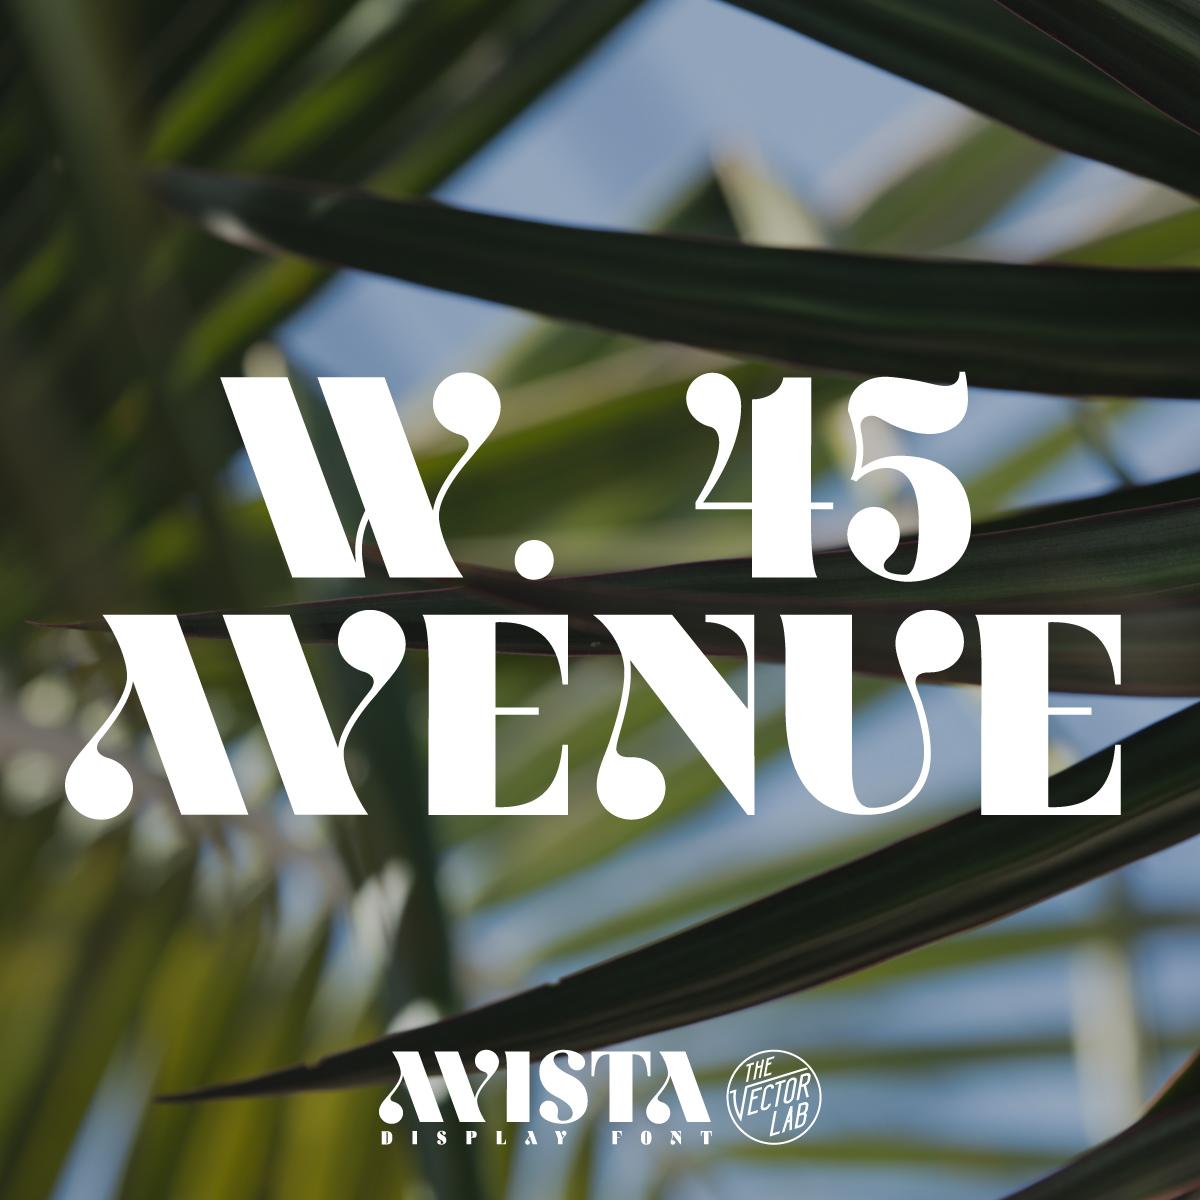 W. 45 Avenue - AVISTA font by Ray Dombroski & TheVectorLab